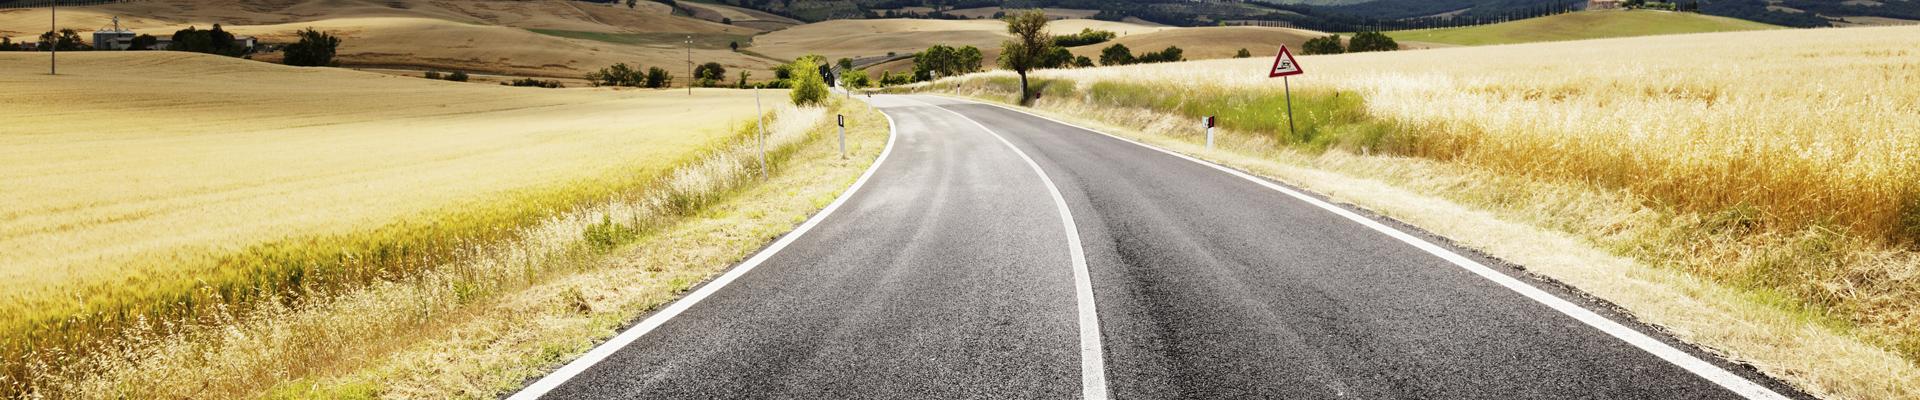 road-through-grass-rolling-hills